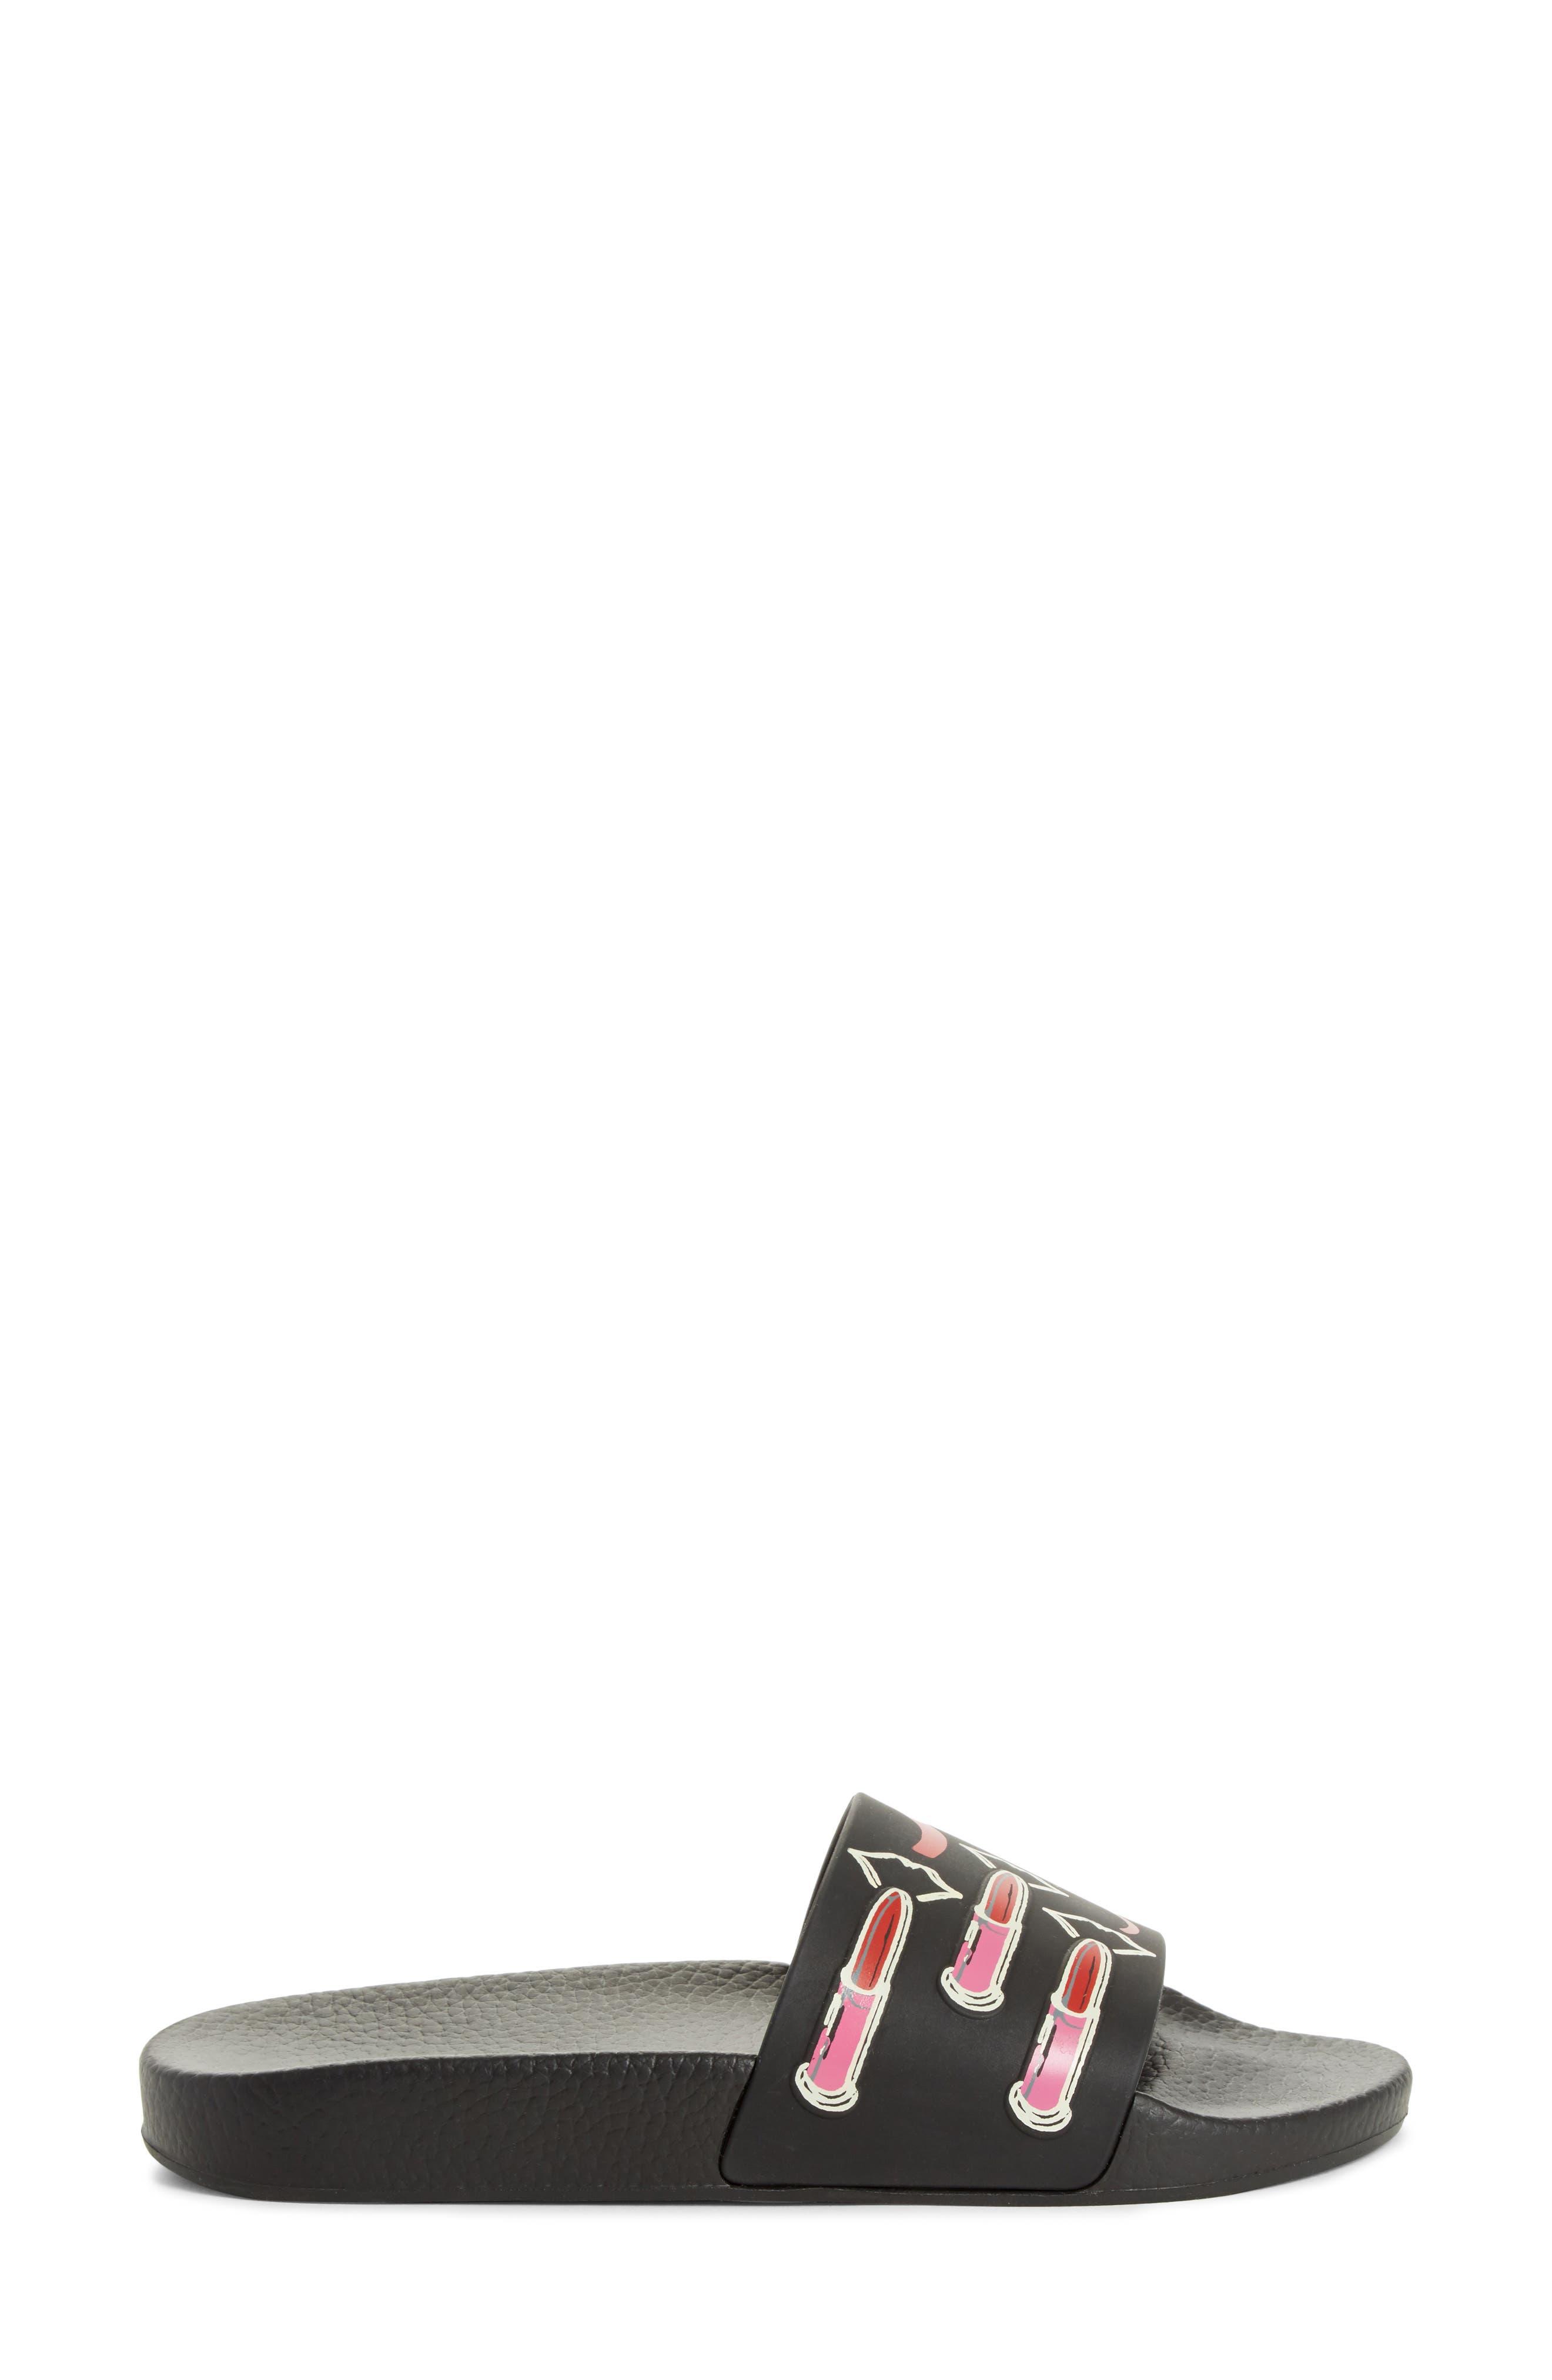 Alternate Image 3  - VALENTINO GARAVANI Lipstick Slide Sandal (Women)